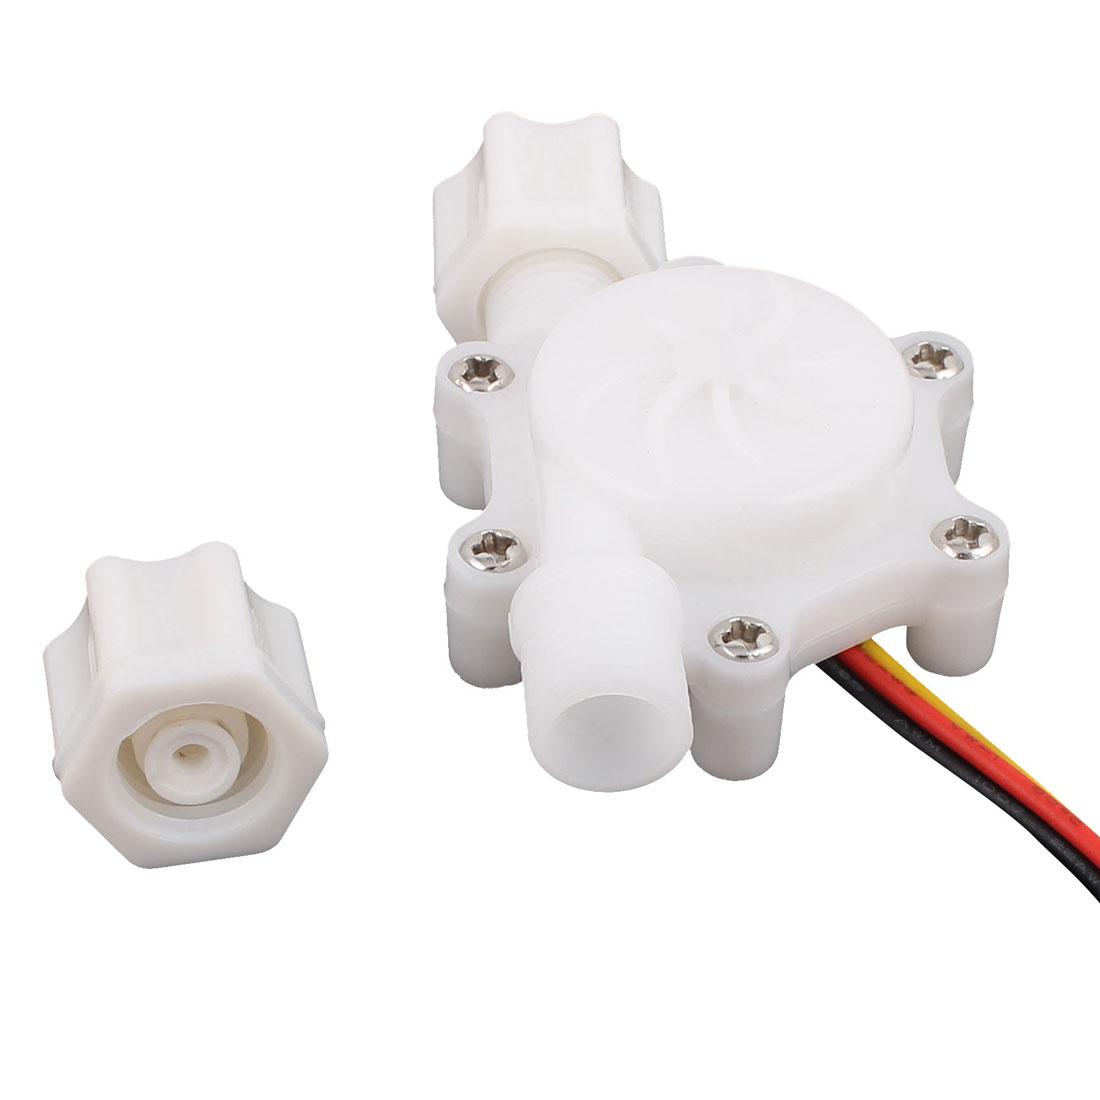 Plastic 0.2-2.5L/min G1/4 Male Thread Water Flow Sensor Flowmeter SEN-HZ06W